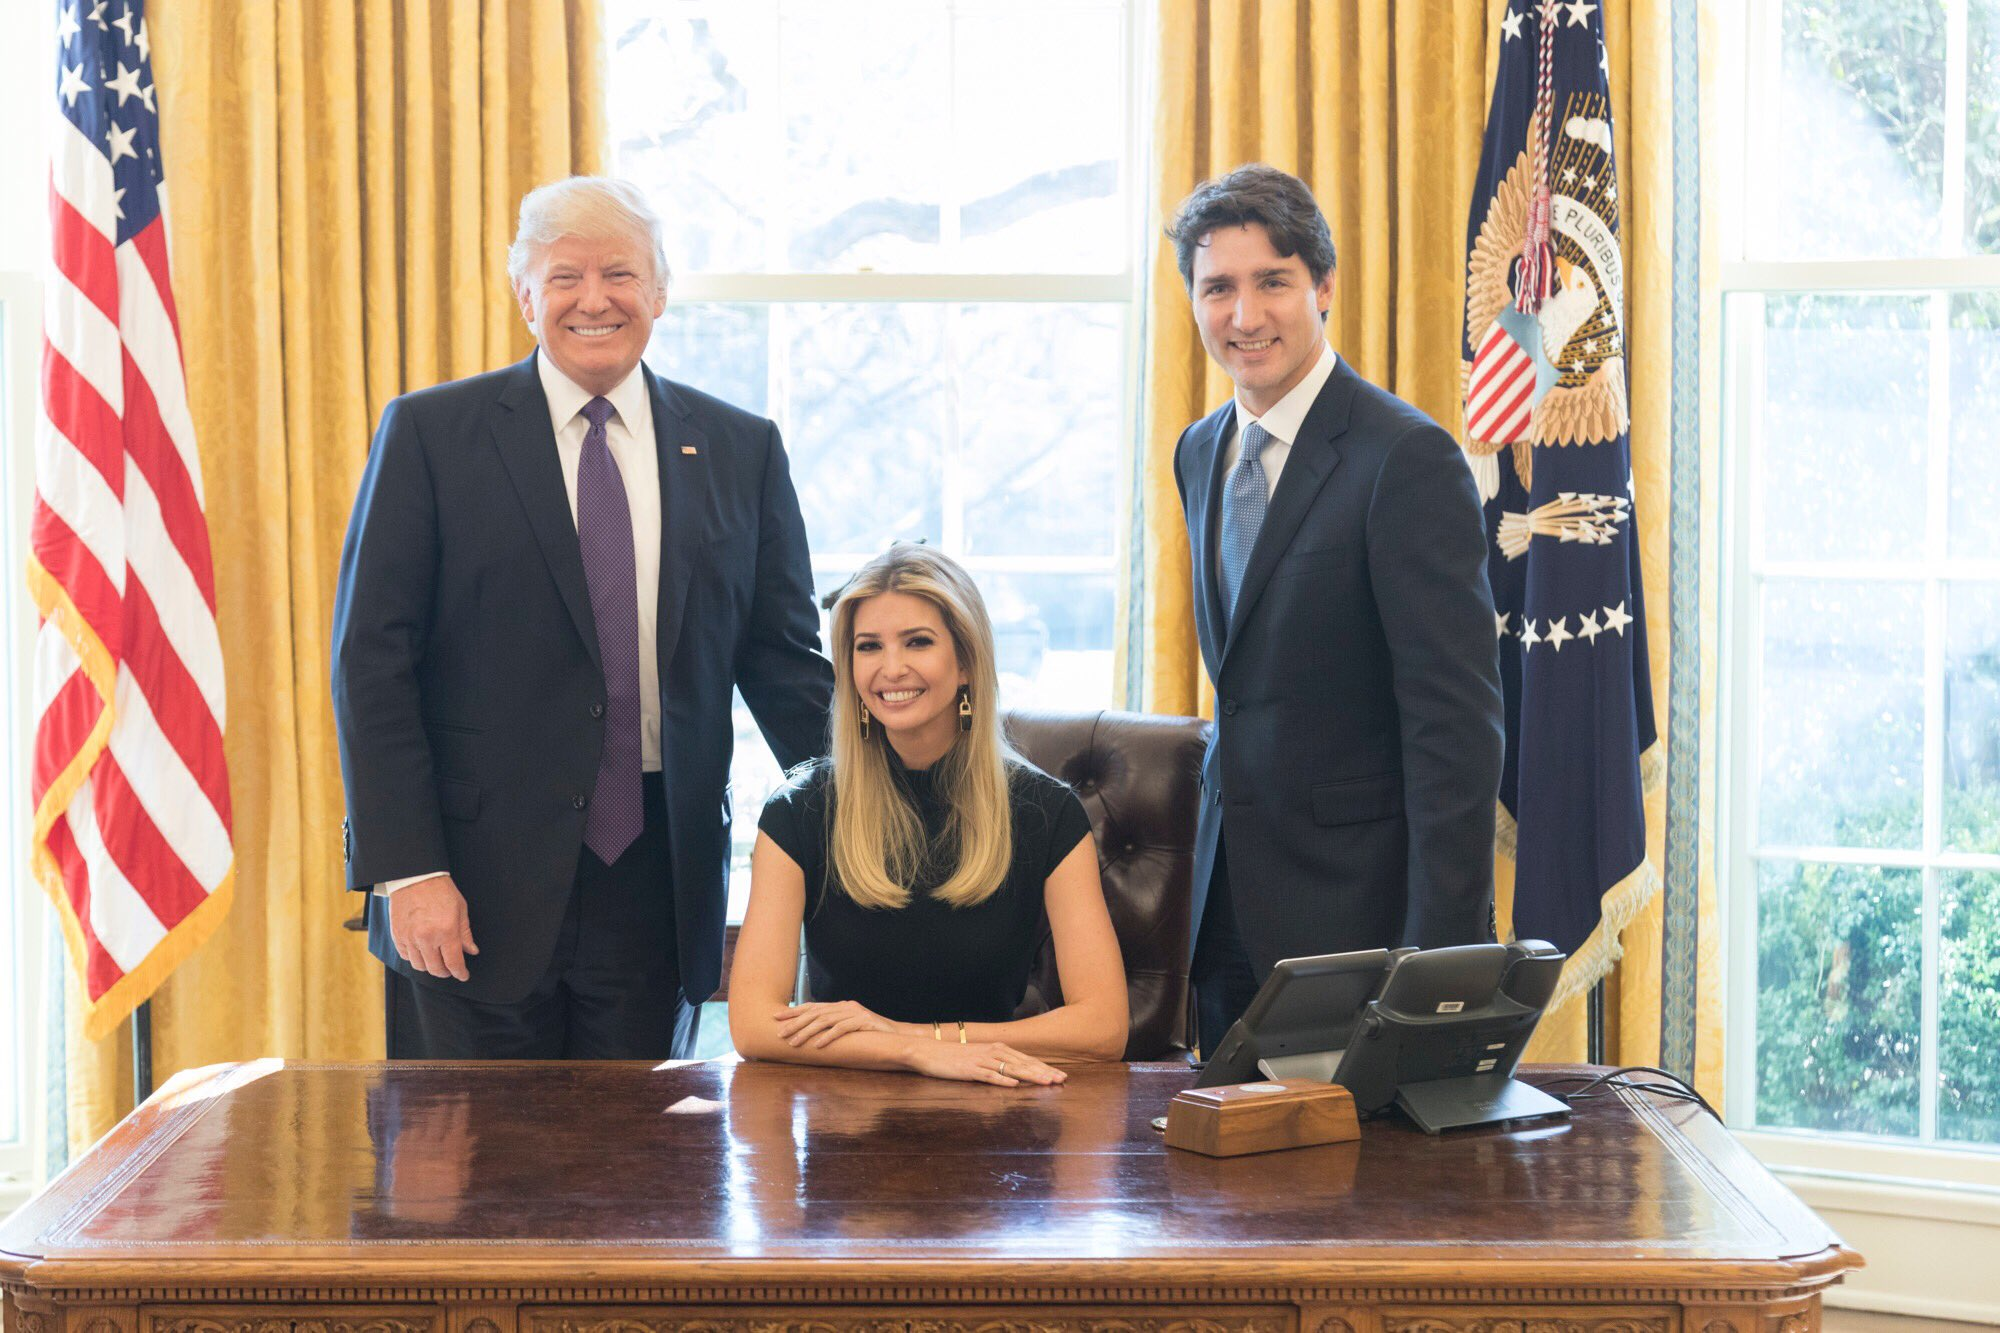 Fotografia cu Ivanka Trump stand pe scaunul prezidential i-a revoltat pe unii americani: